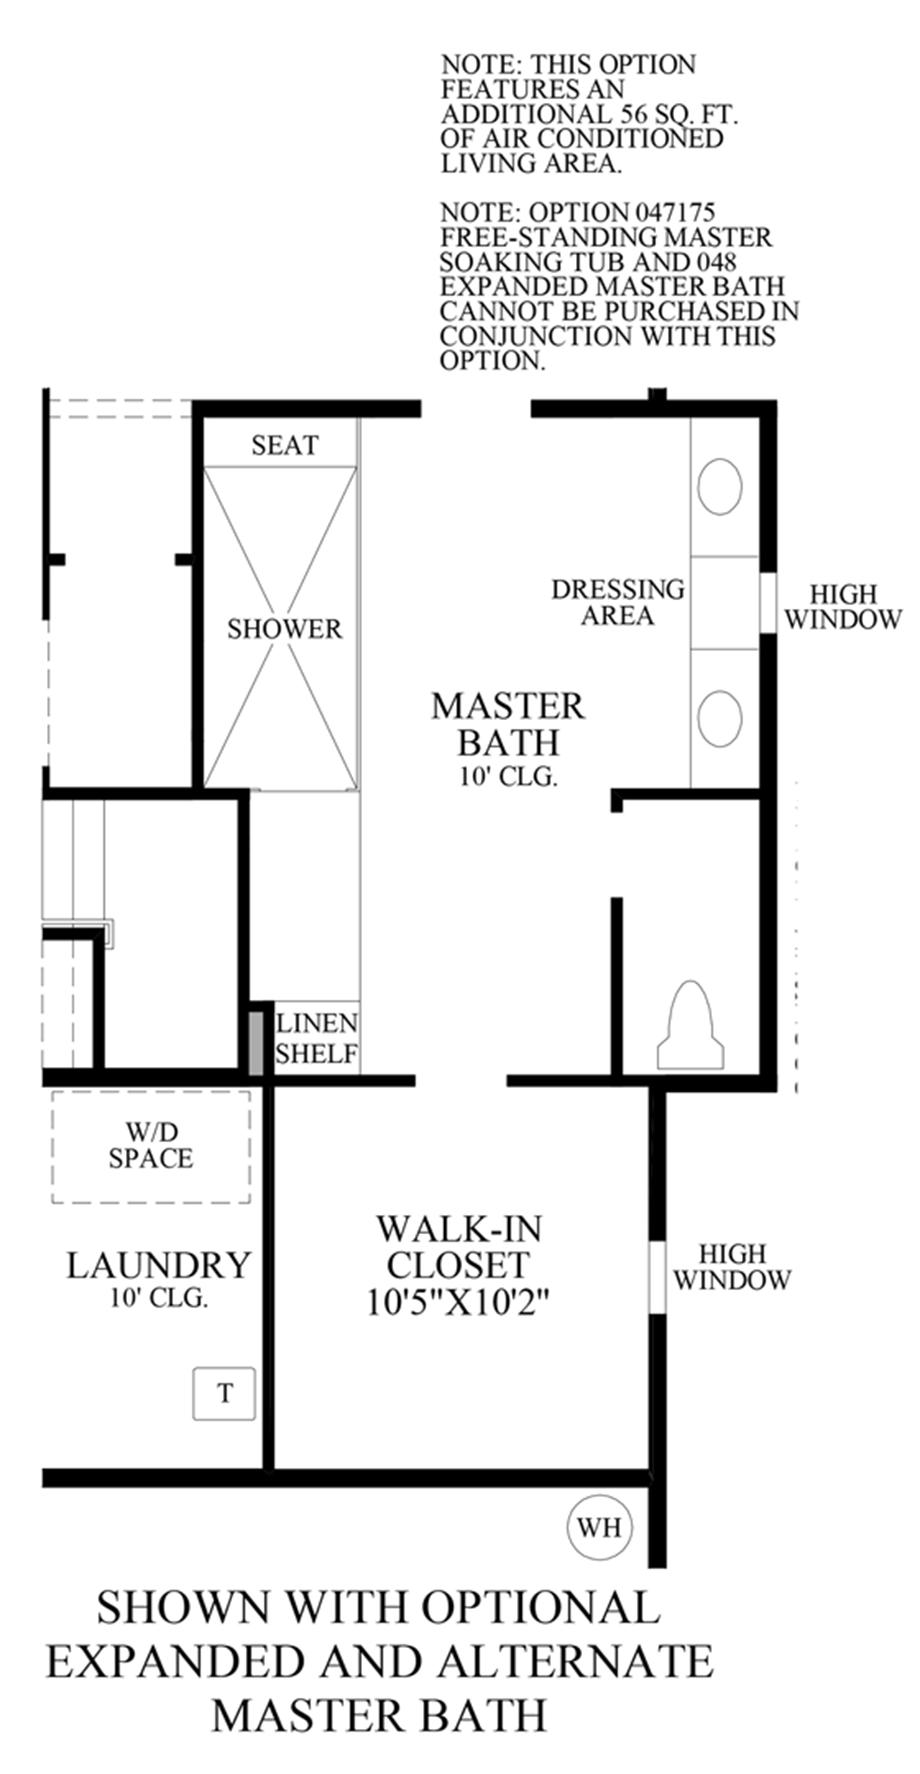 Optional Expanded & Alternate Master Bath Floor Plan